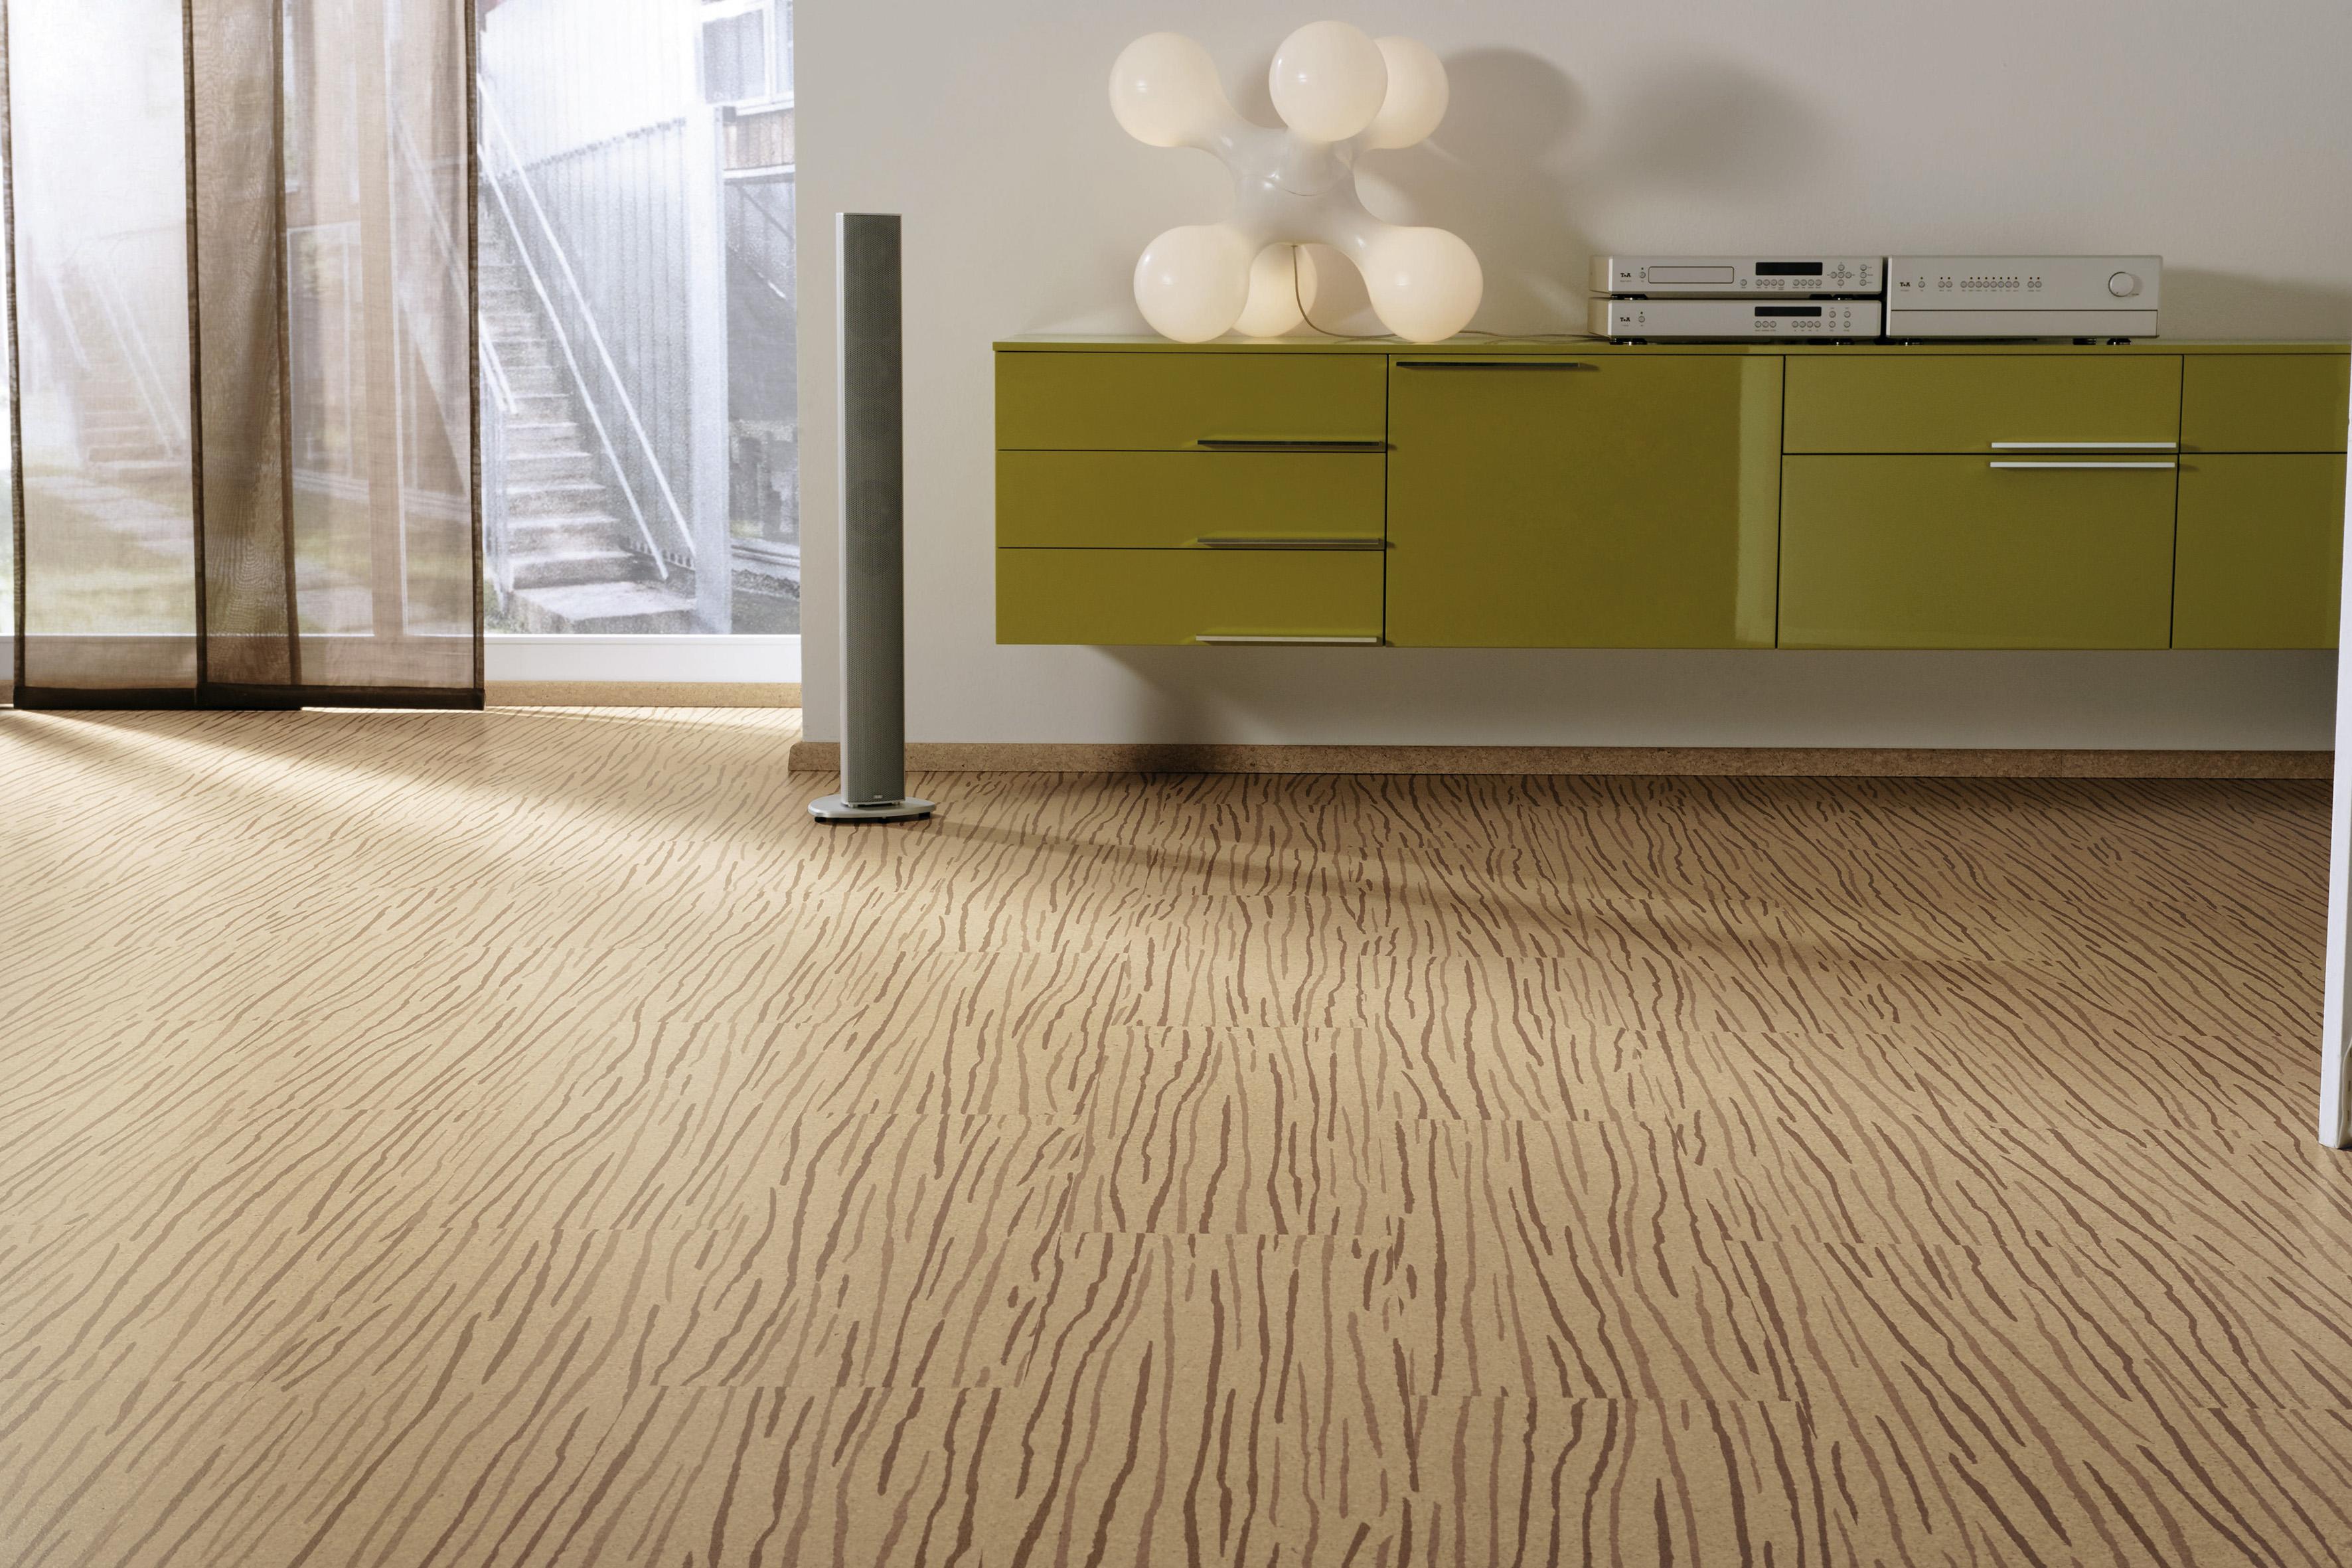 modern cork flooring cork flooring kitchen Flooring Interiors Home Design